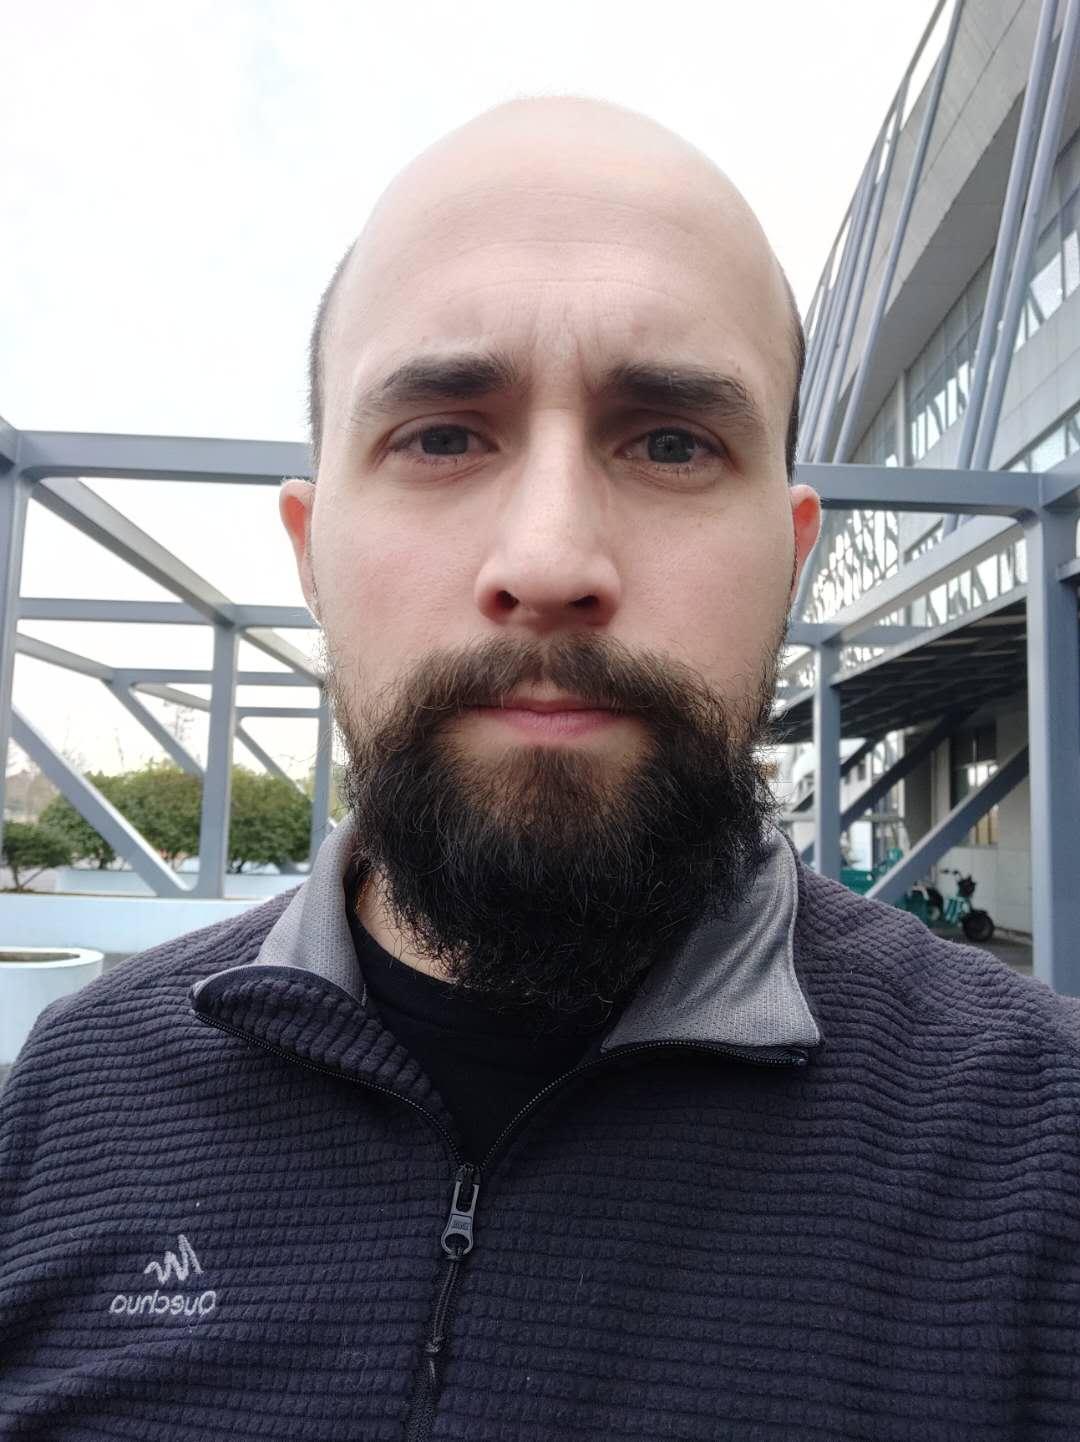 Juan Ignacio Vilchez Morillas